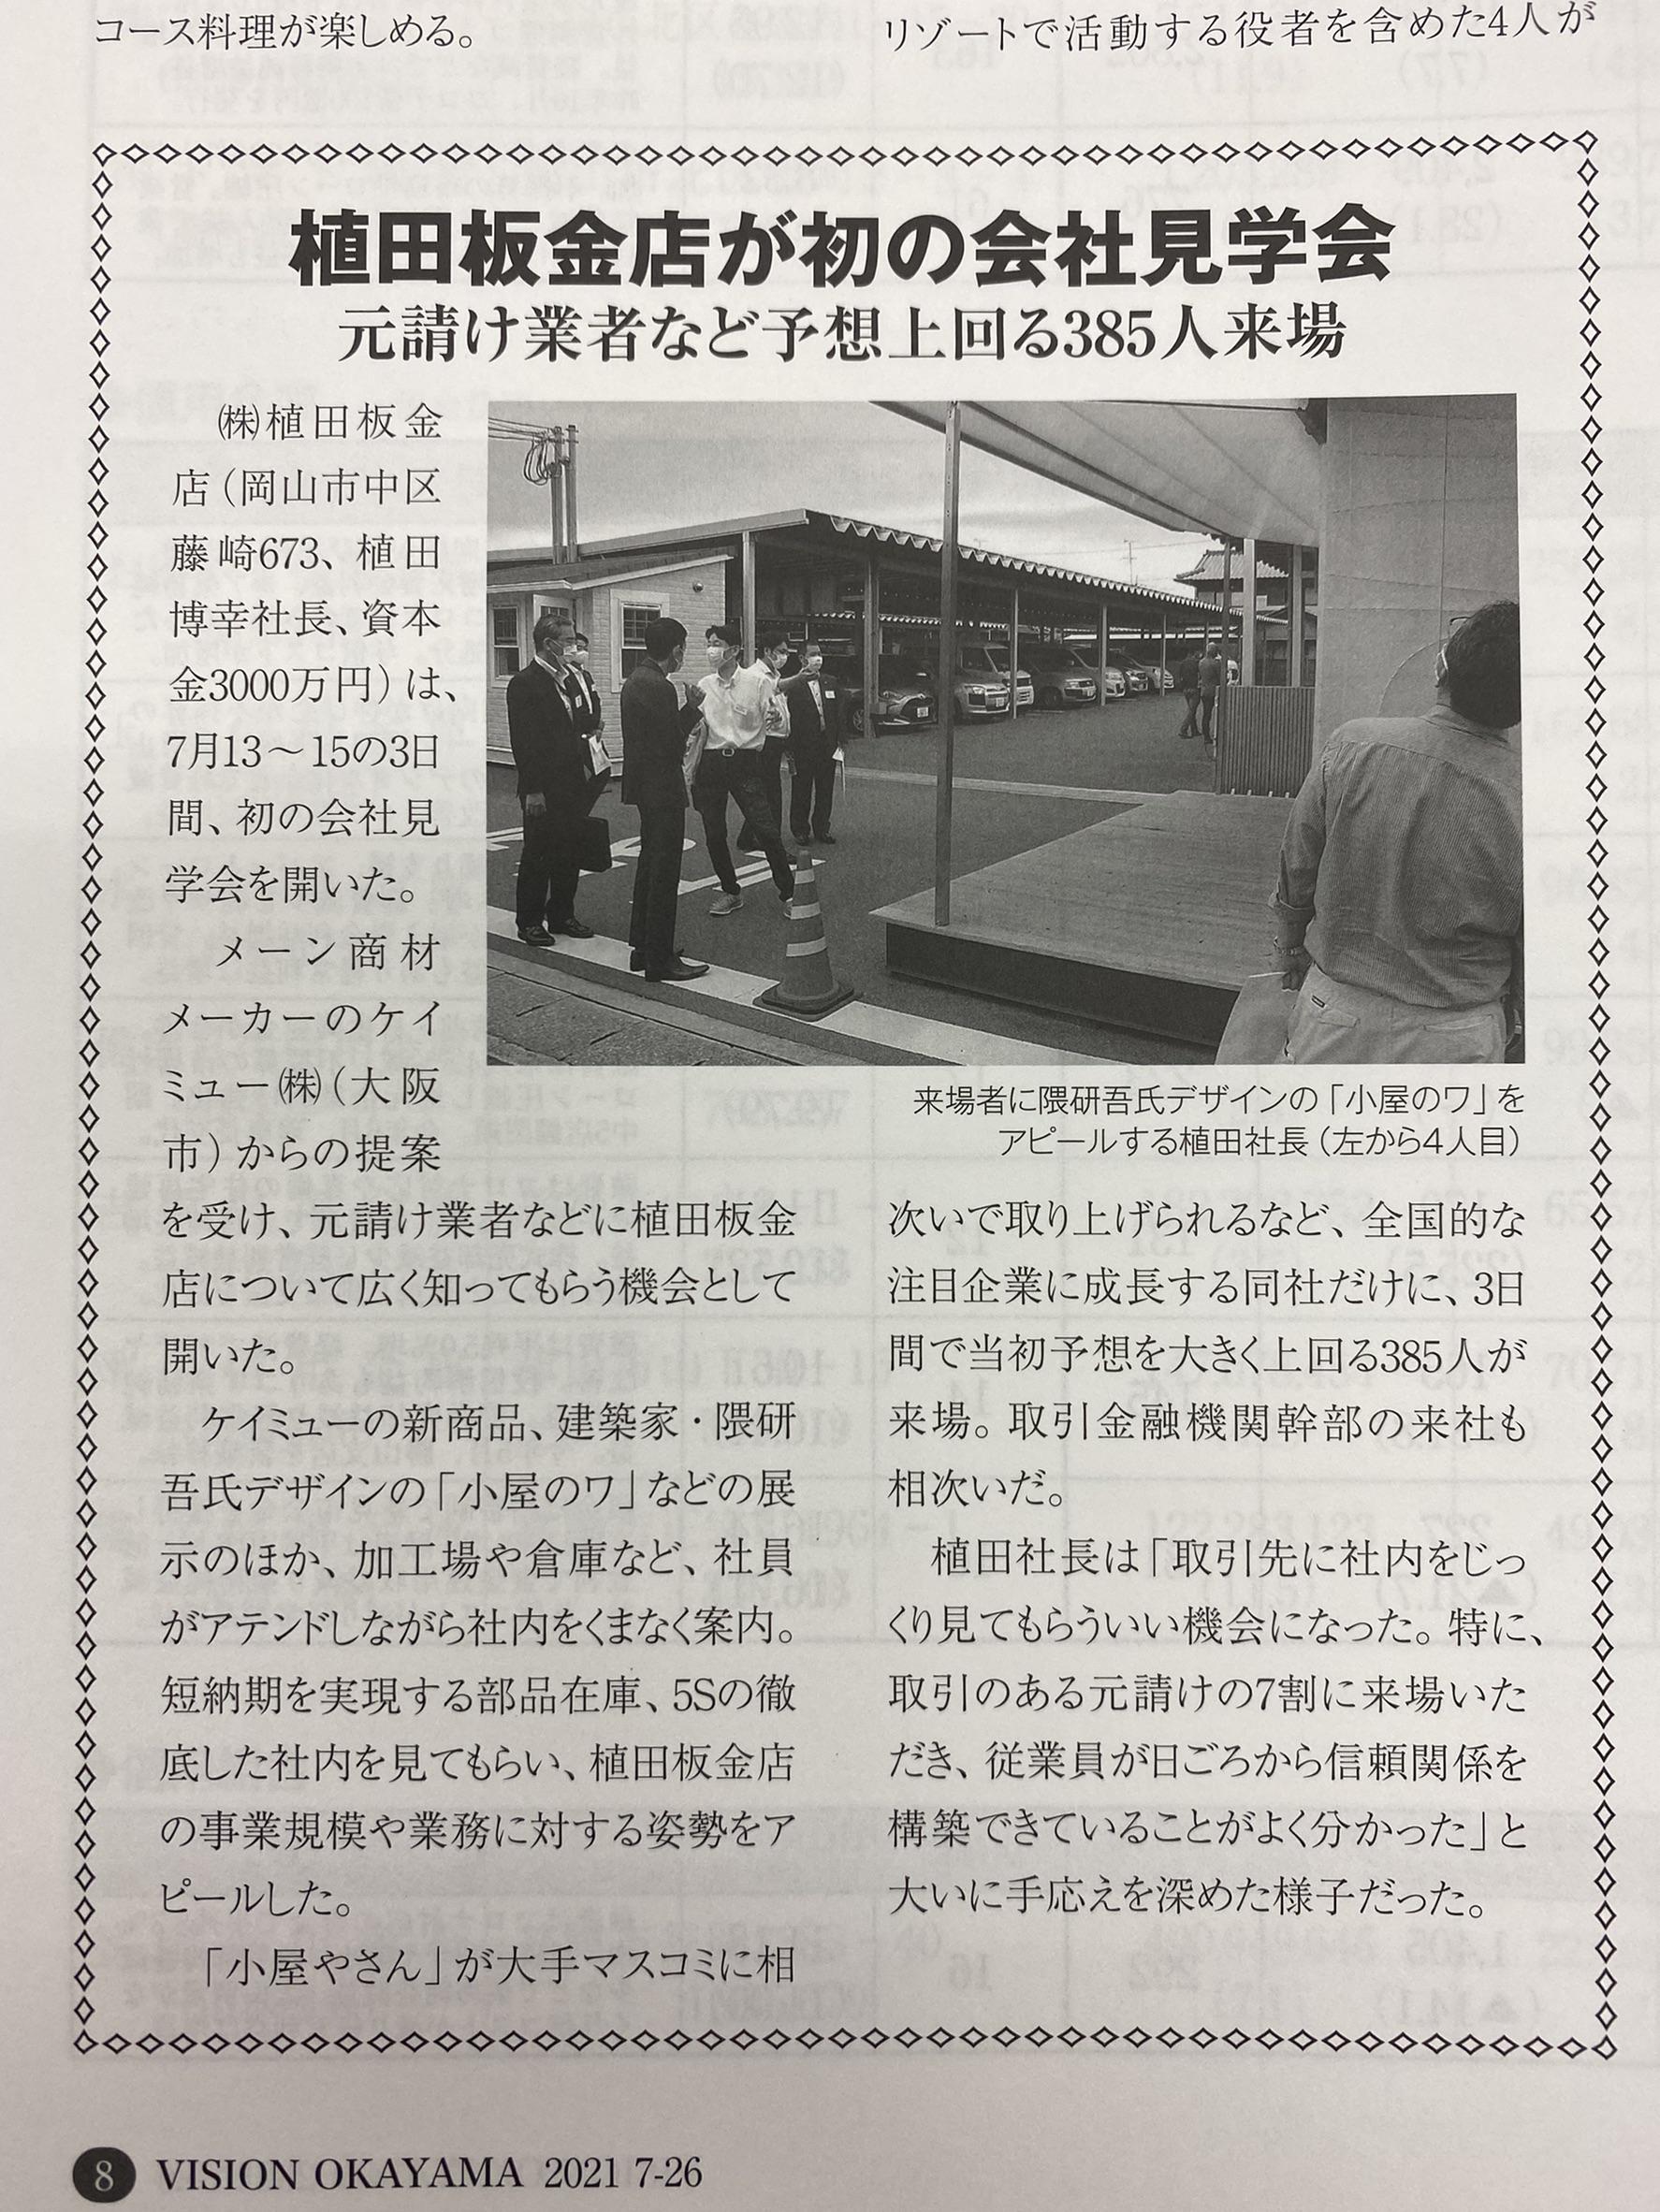 VISION OKAYAMA 2021.07.26号 No.2148 植田板金店が初の会社見学会